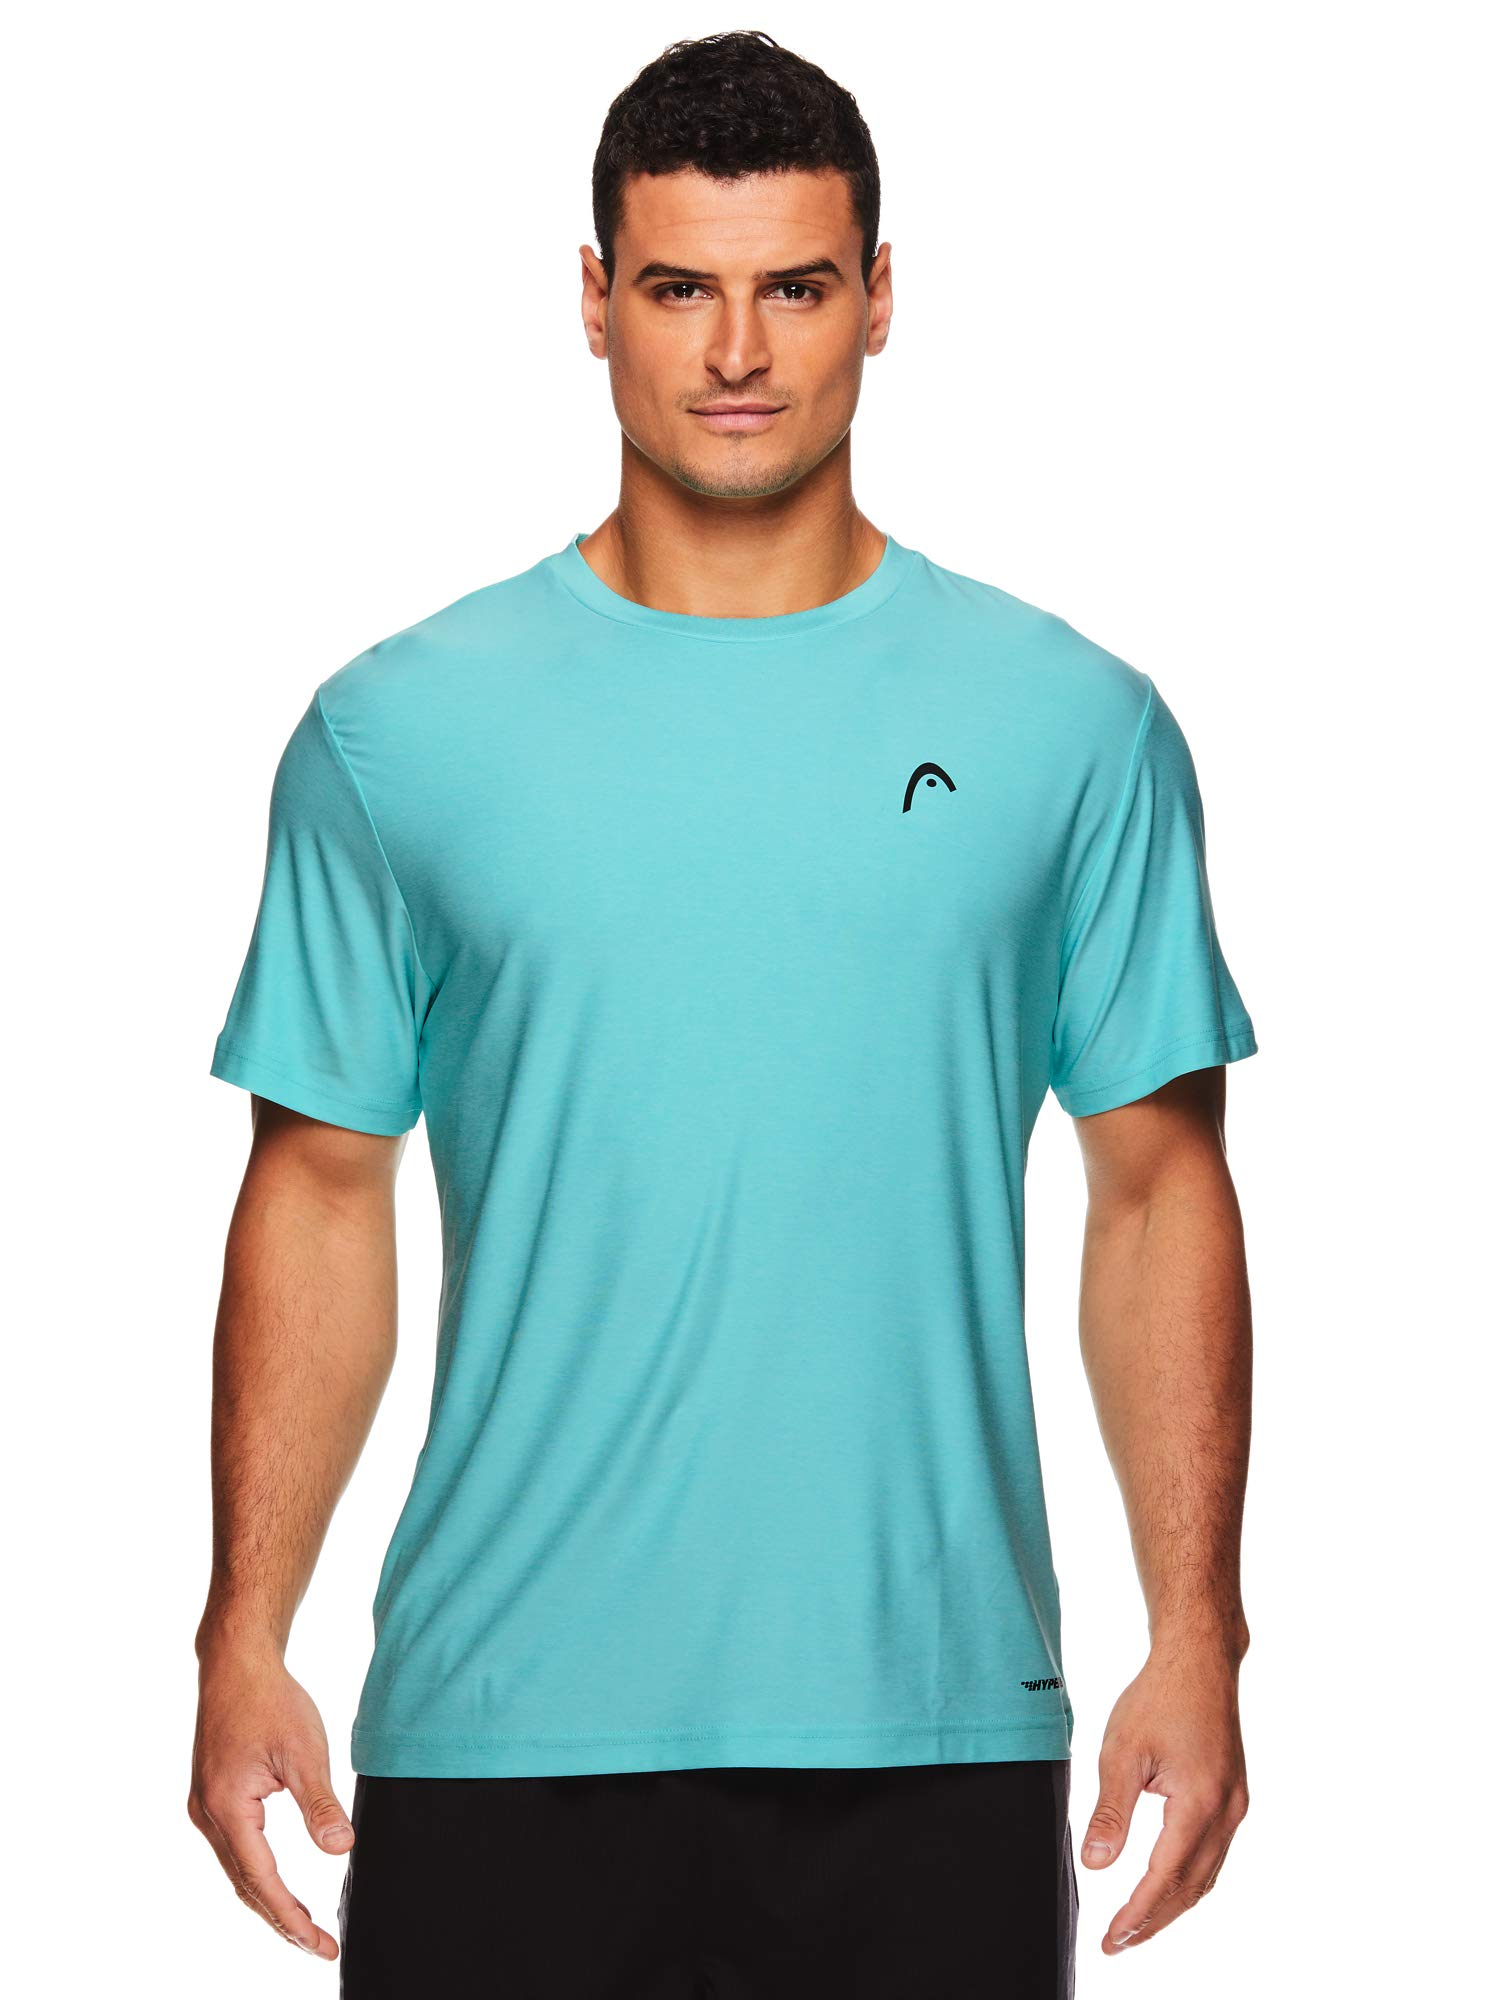 HEAD Men's Hypertek Crewneck Gym Tennis & Workout T-Shirt - Short Sleeve Activewear Top - Score Hypertek Aruba Blue Heather, Small